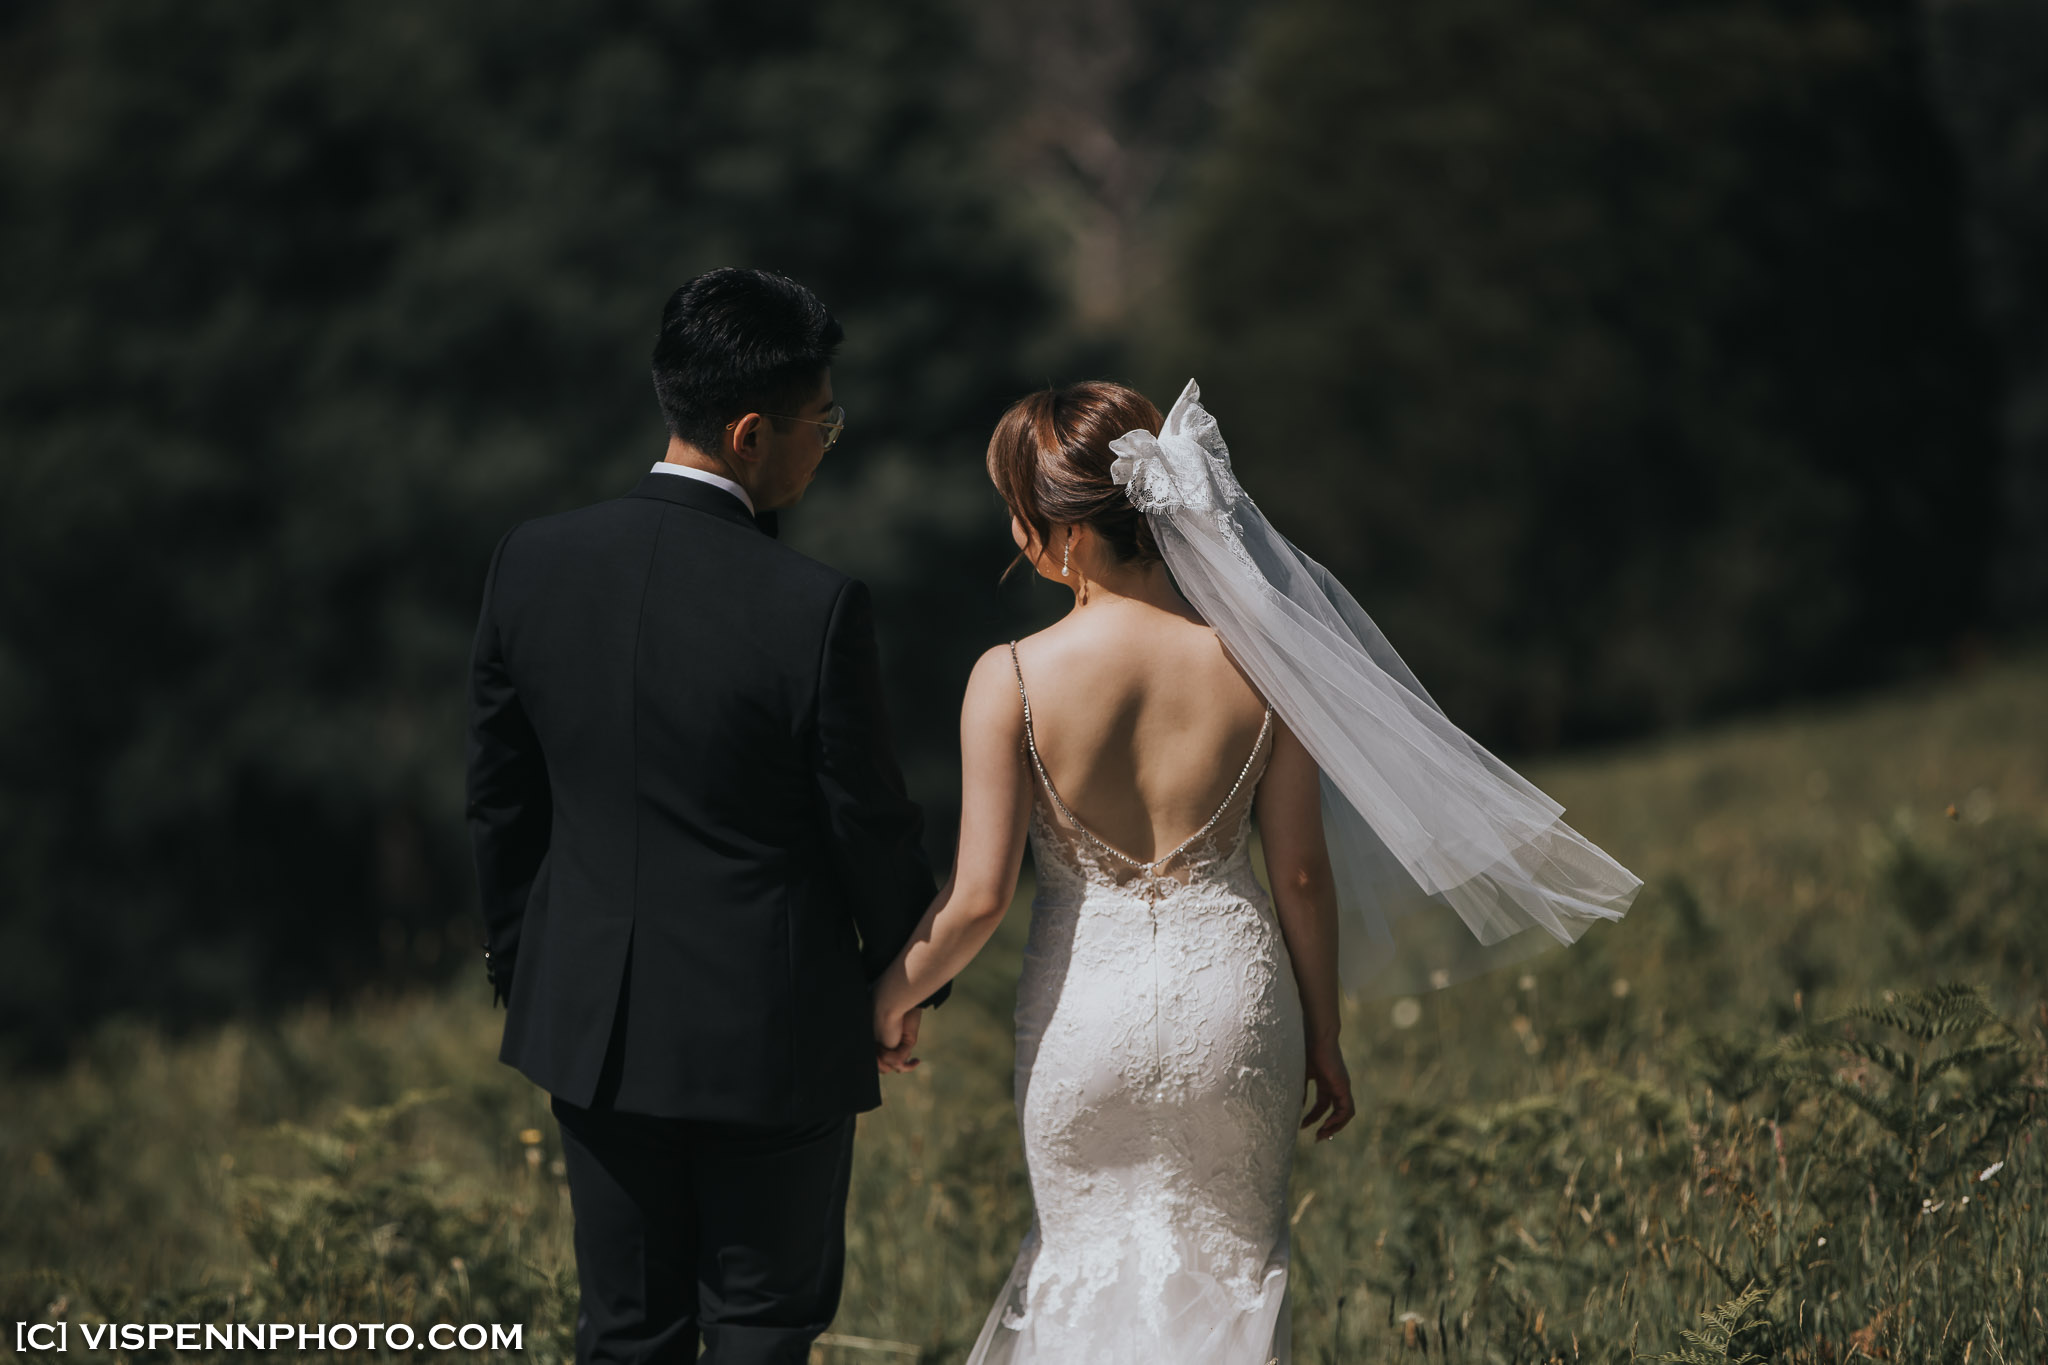 WEDDING DAY Photography Melbourne VISPENN 墨尔本 婚礼跟拍 婚礼摄像 婚礼摄影 结婚照 登记照 ElitaPB 06584 2P 1DX2 VISPENN